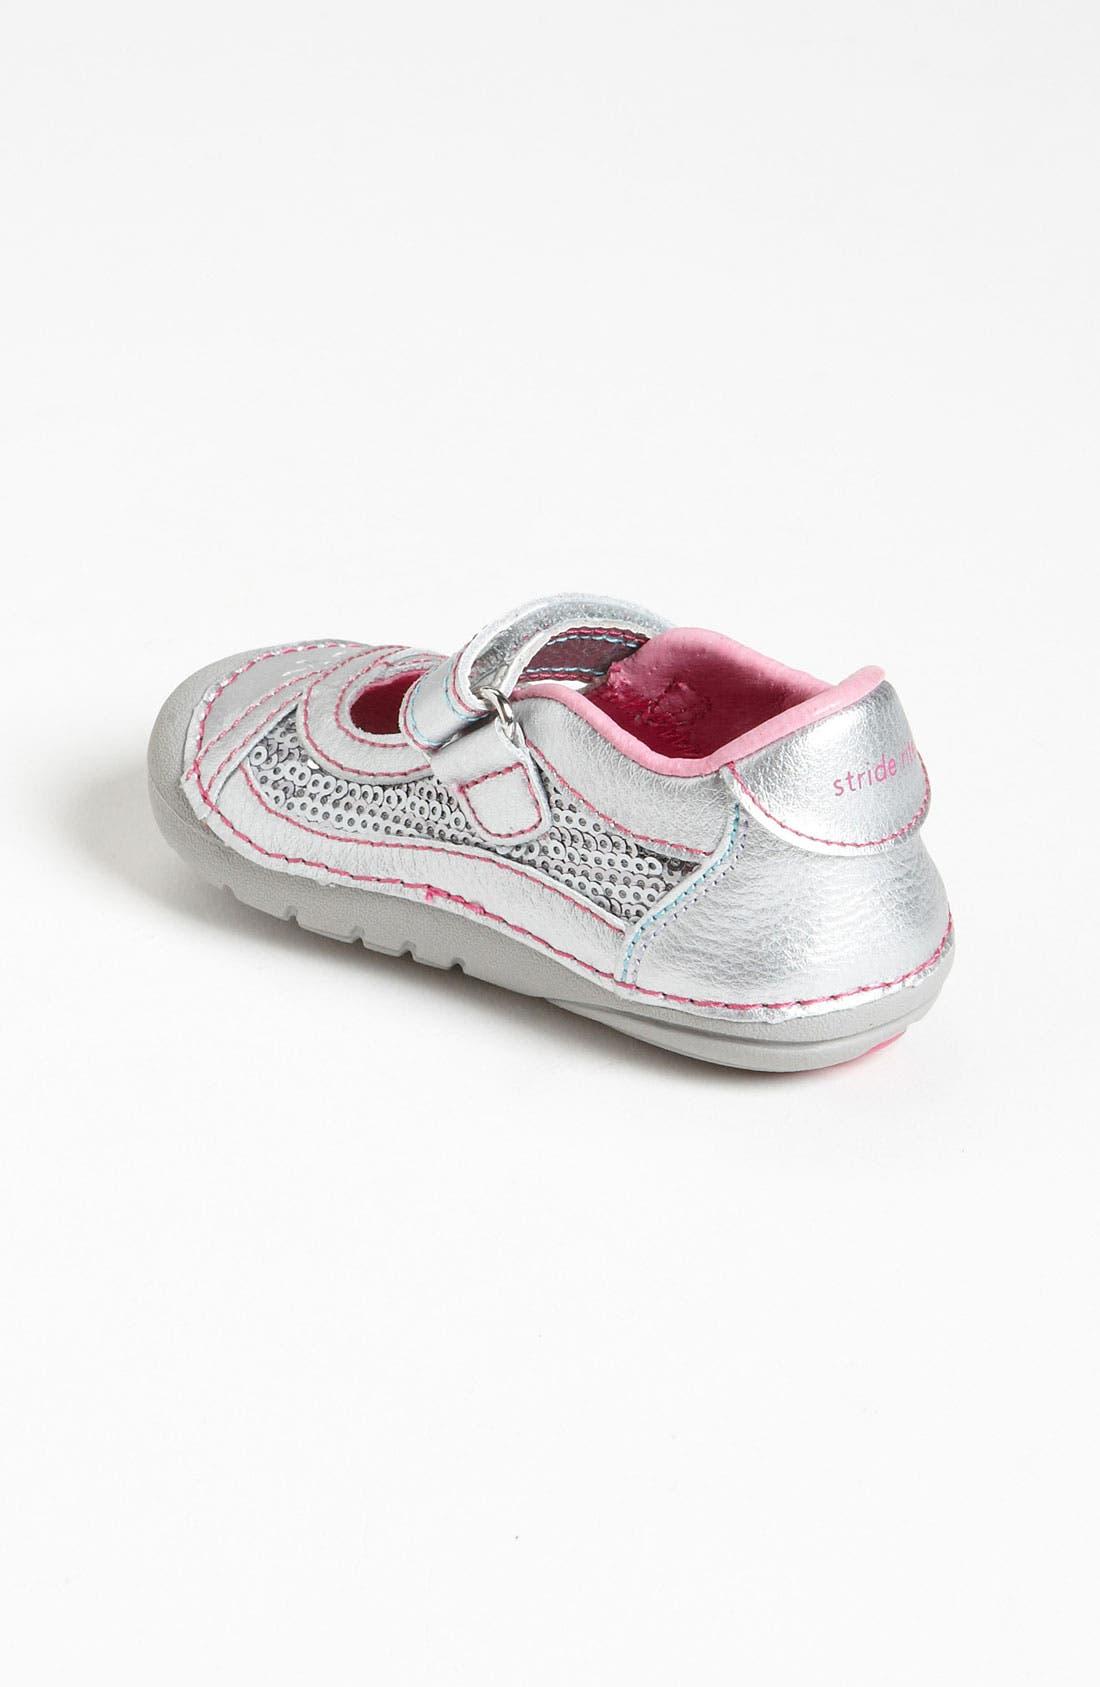 Alternate Image 2  - Stride Rite 'Dream Queen' Sneaker (Baby & Walker)